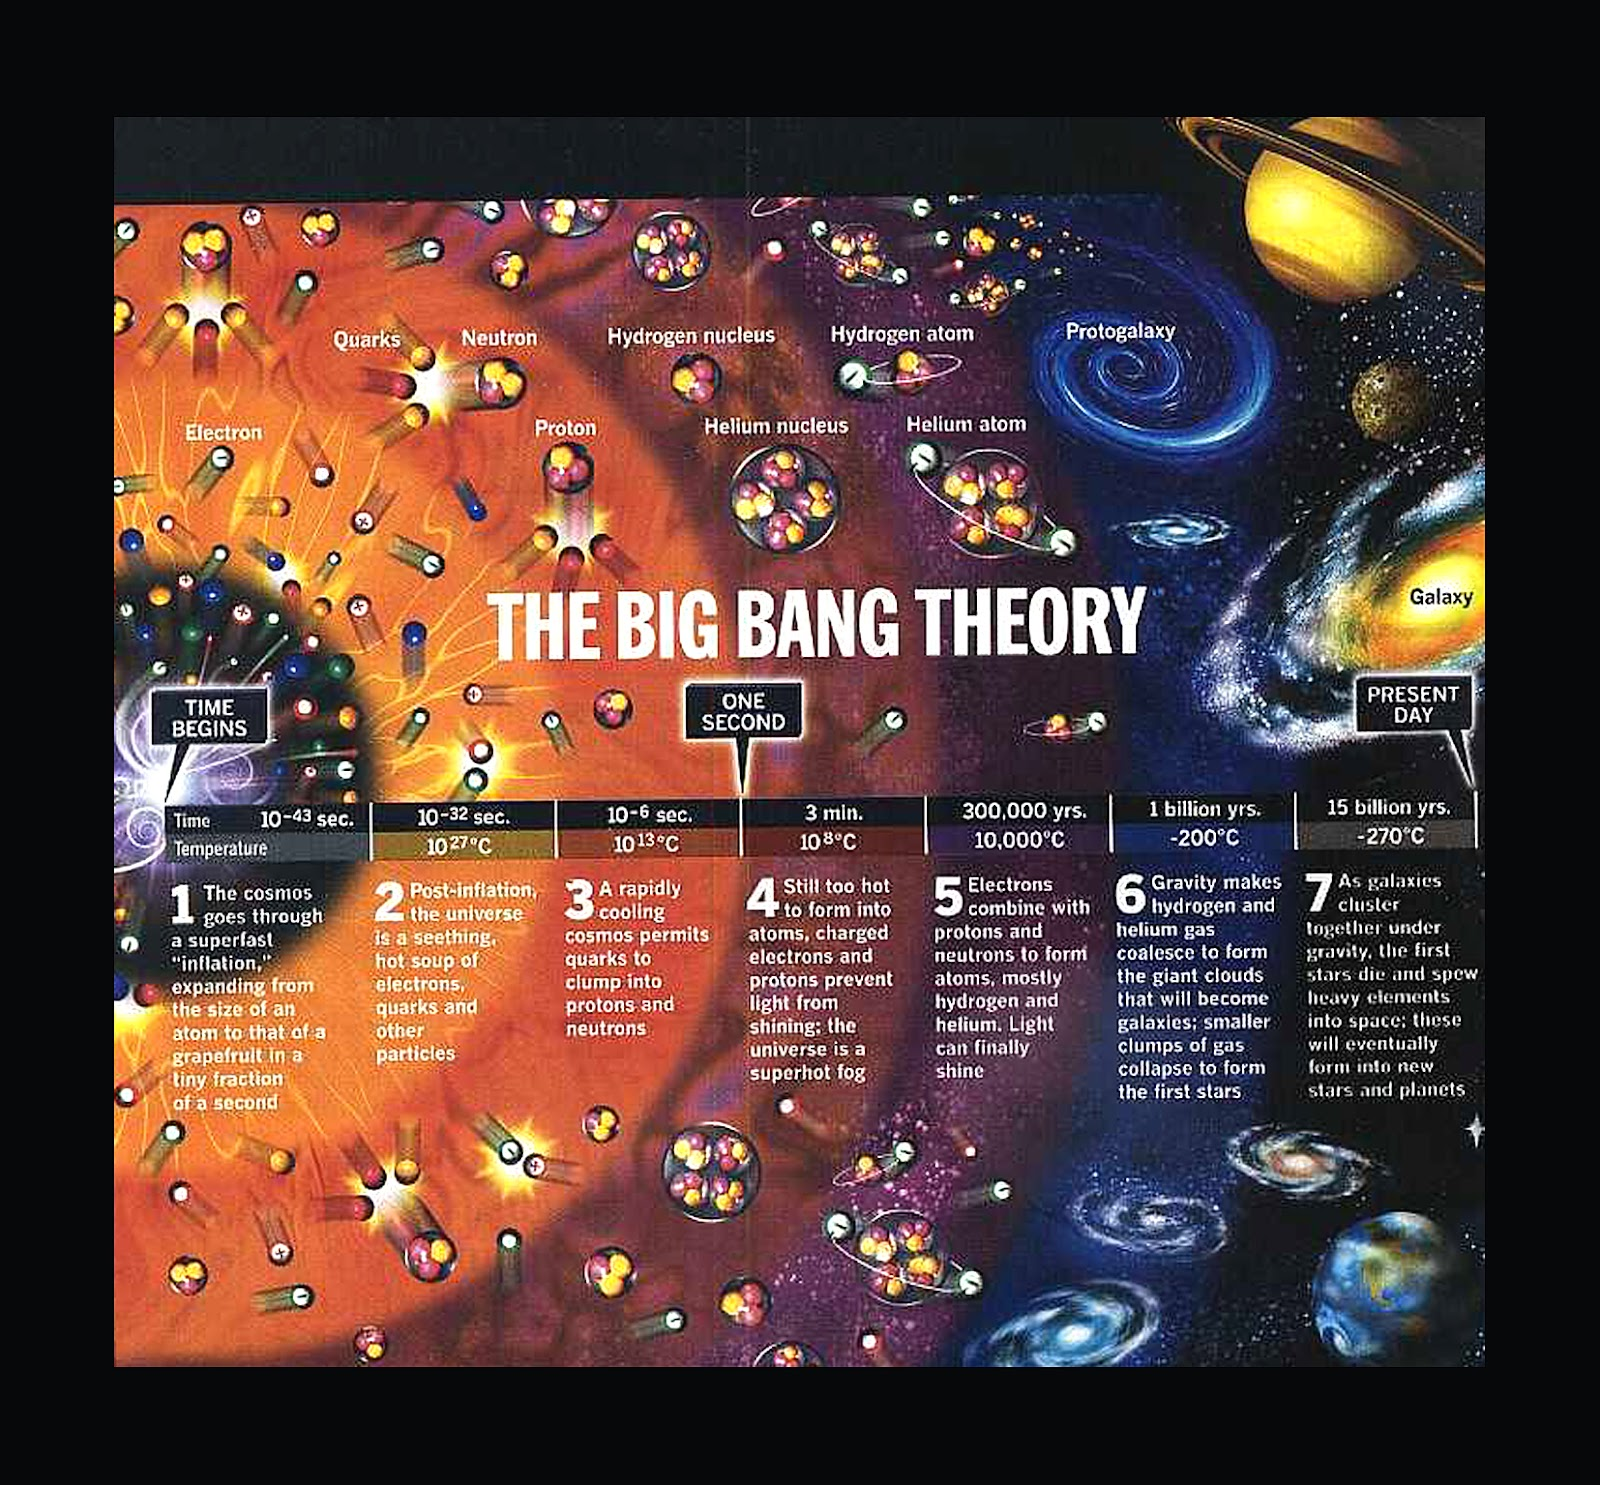 imagens para colorir sobre a teoria do big bang